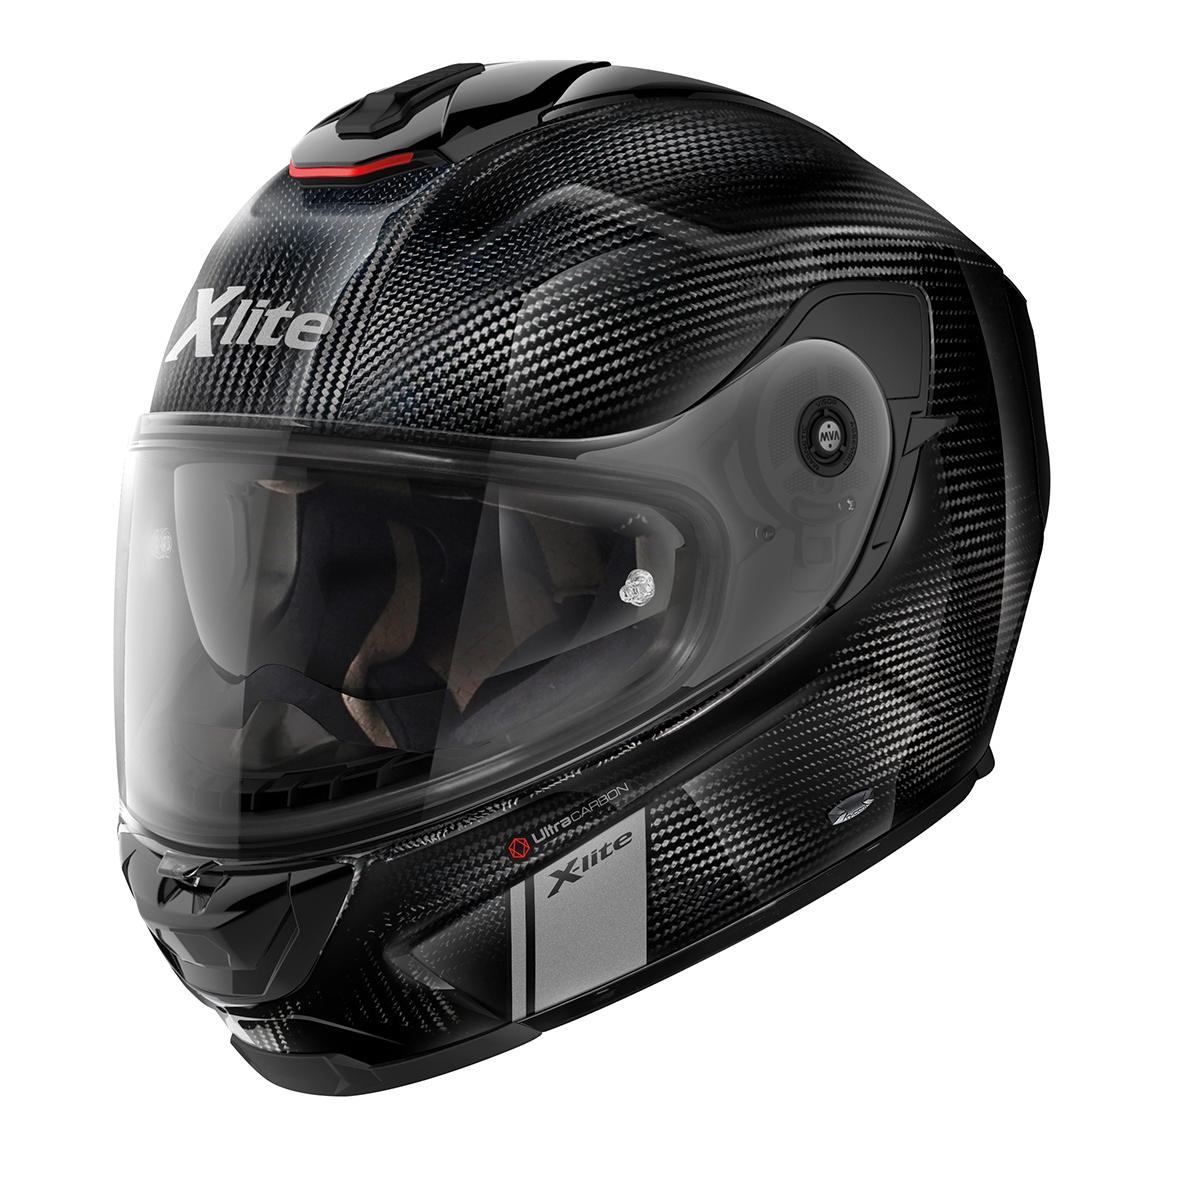 Moto helma X-Lite X-903 Ultra Carbon Modern Class N-Com Carbon 101